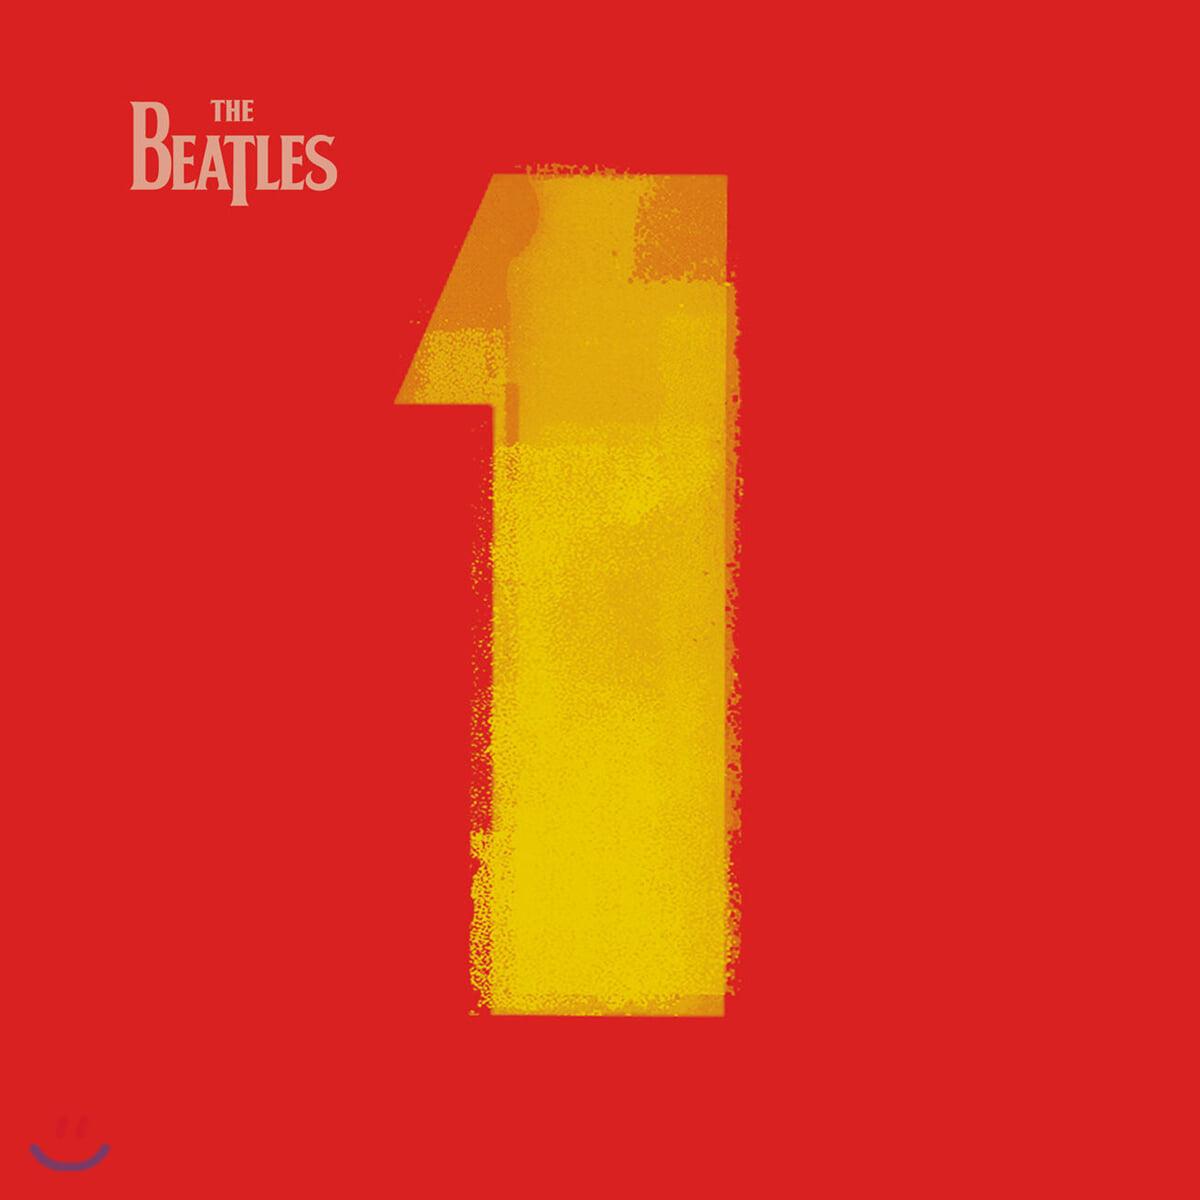 The Beatles - The Beatles 1 비틀즈 [2LP]